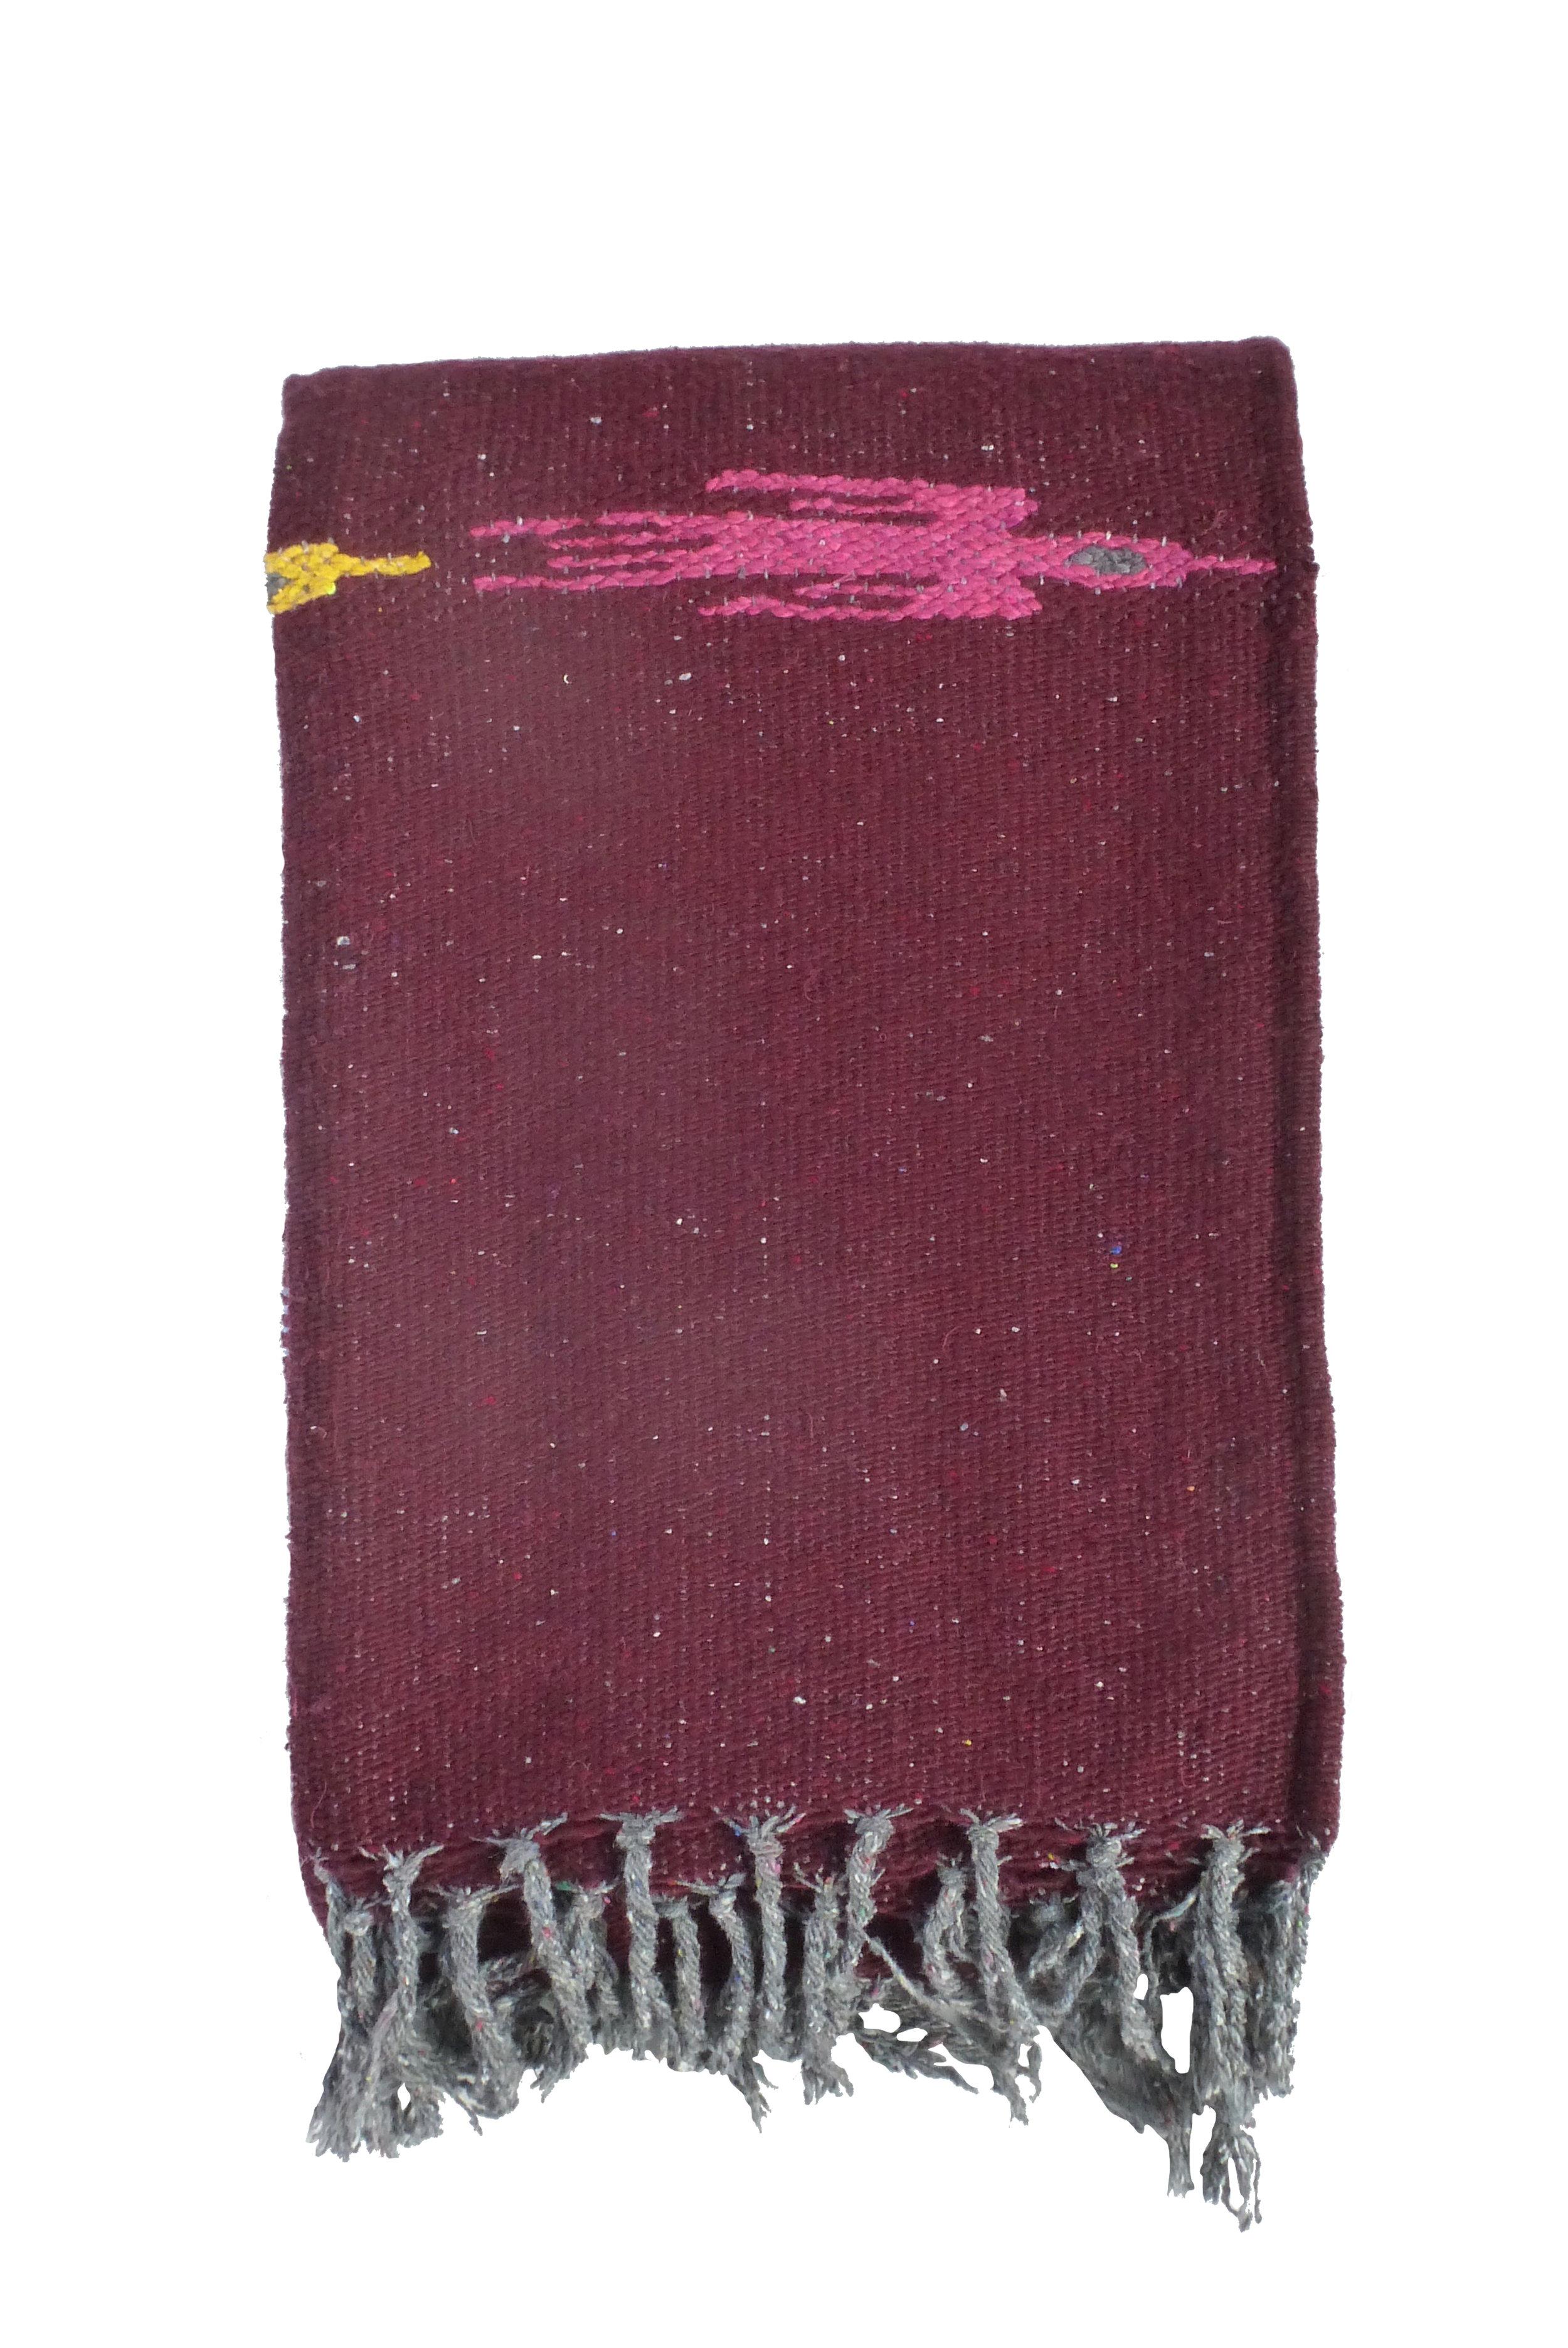 THUNDERBIRD BLAKET - BURGUNDY